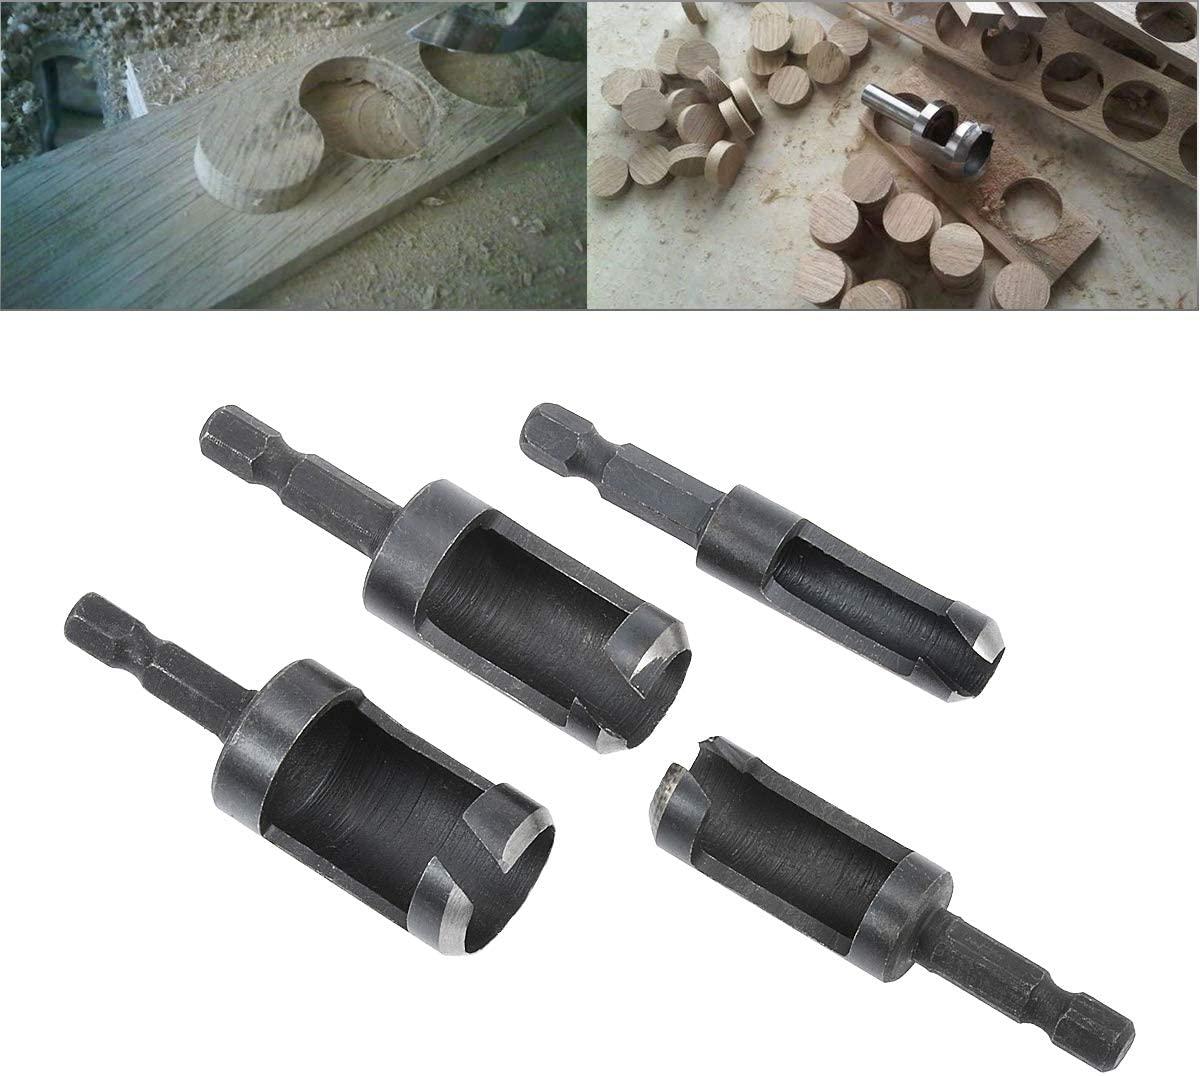 HOHXEN 4pcs Hex Shank Drill Bit Set Plug Wood Cutter Tool Woodworking Tenon for Counter Bored Holes Drill Bits Set